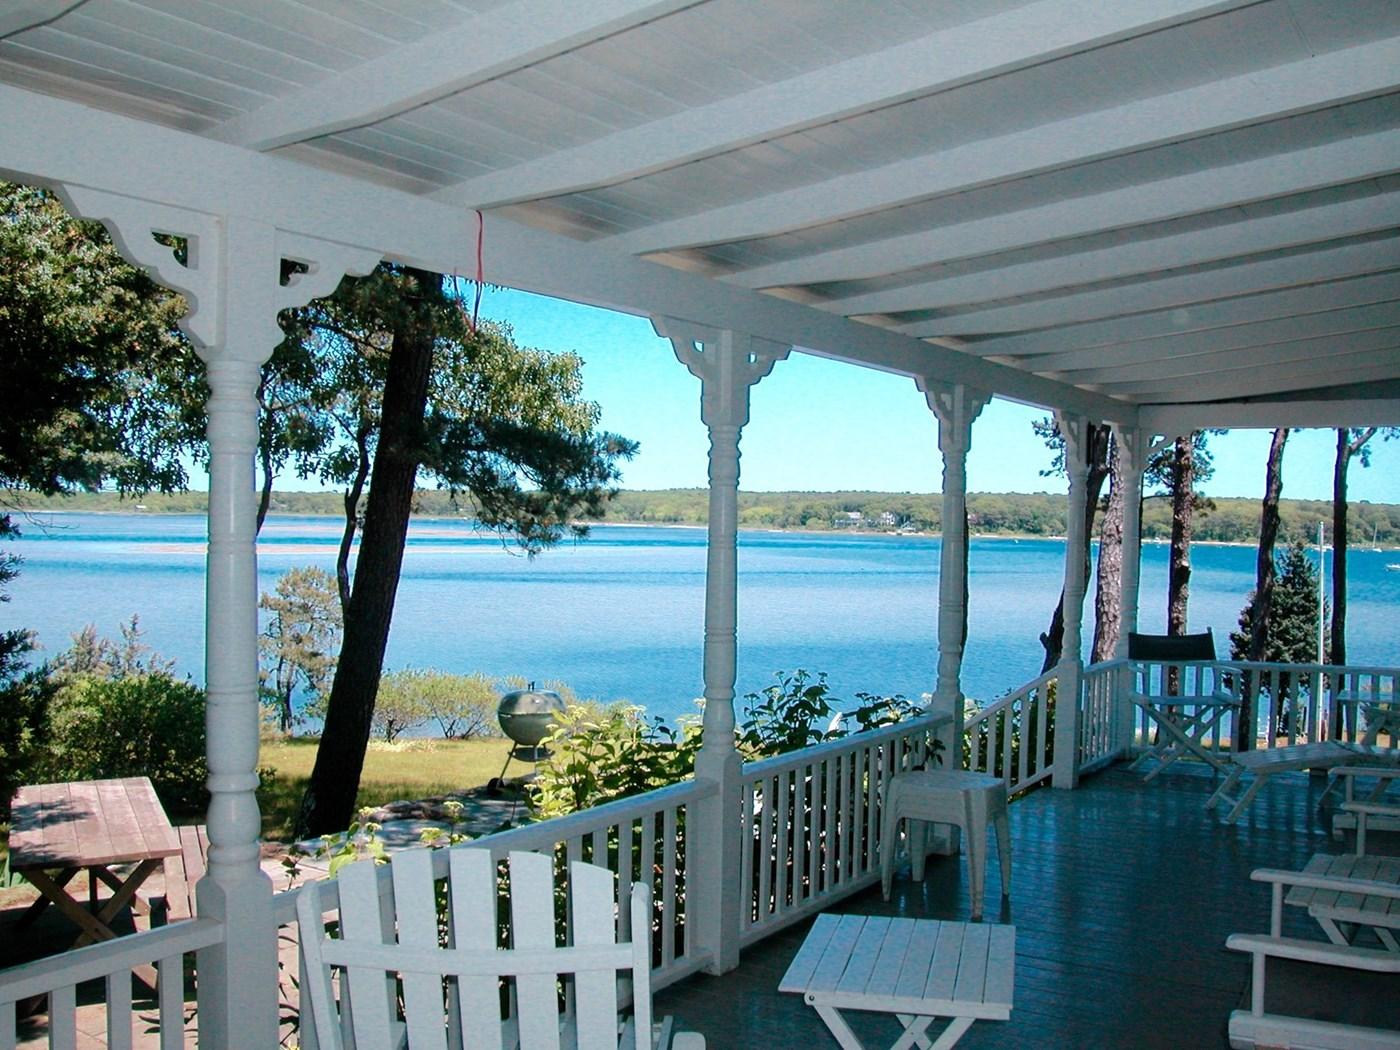 Vineyard Haven Vacation Rental Home In Martha's Vineyard